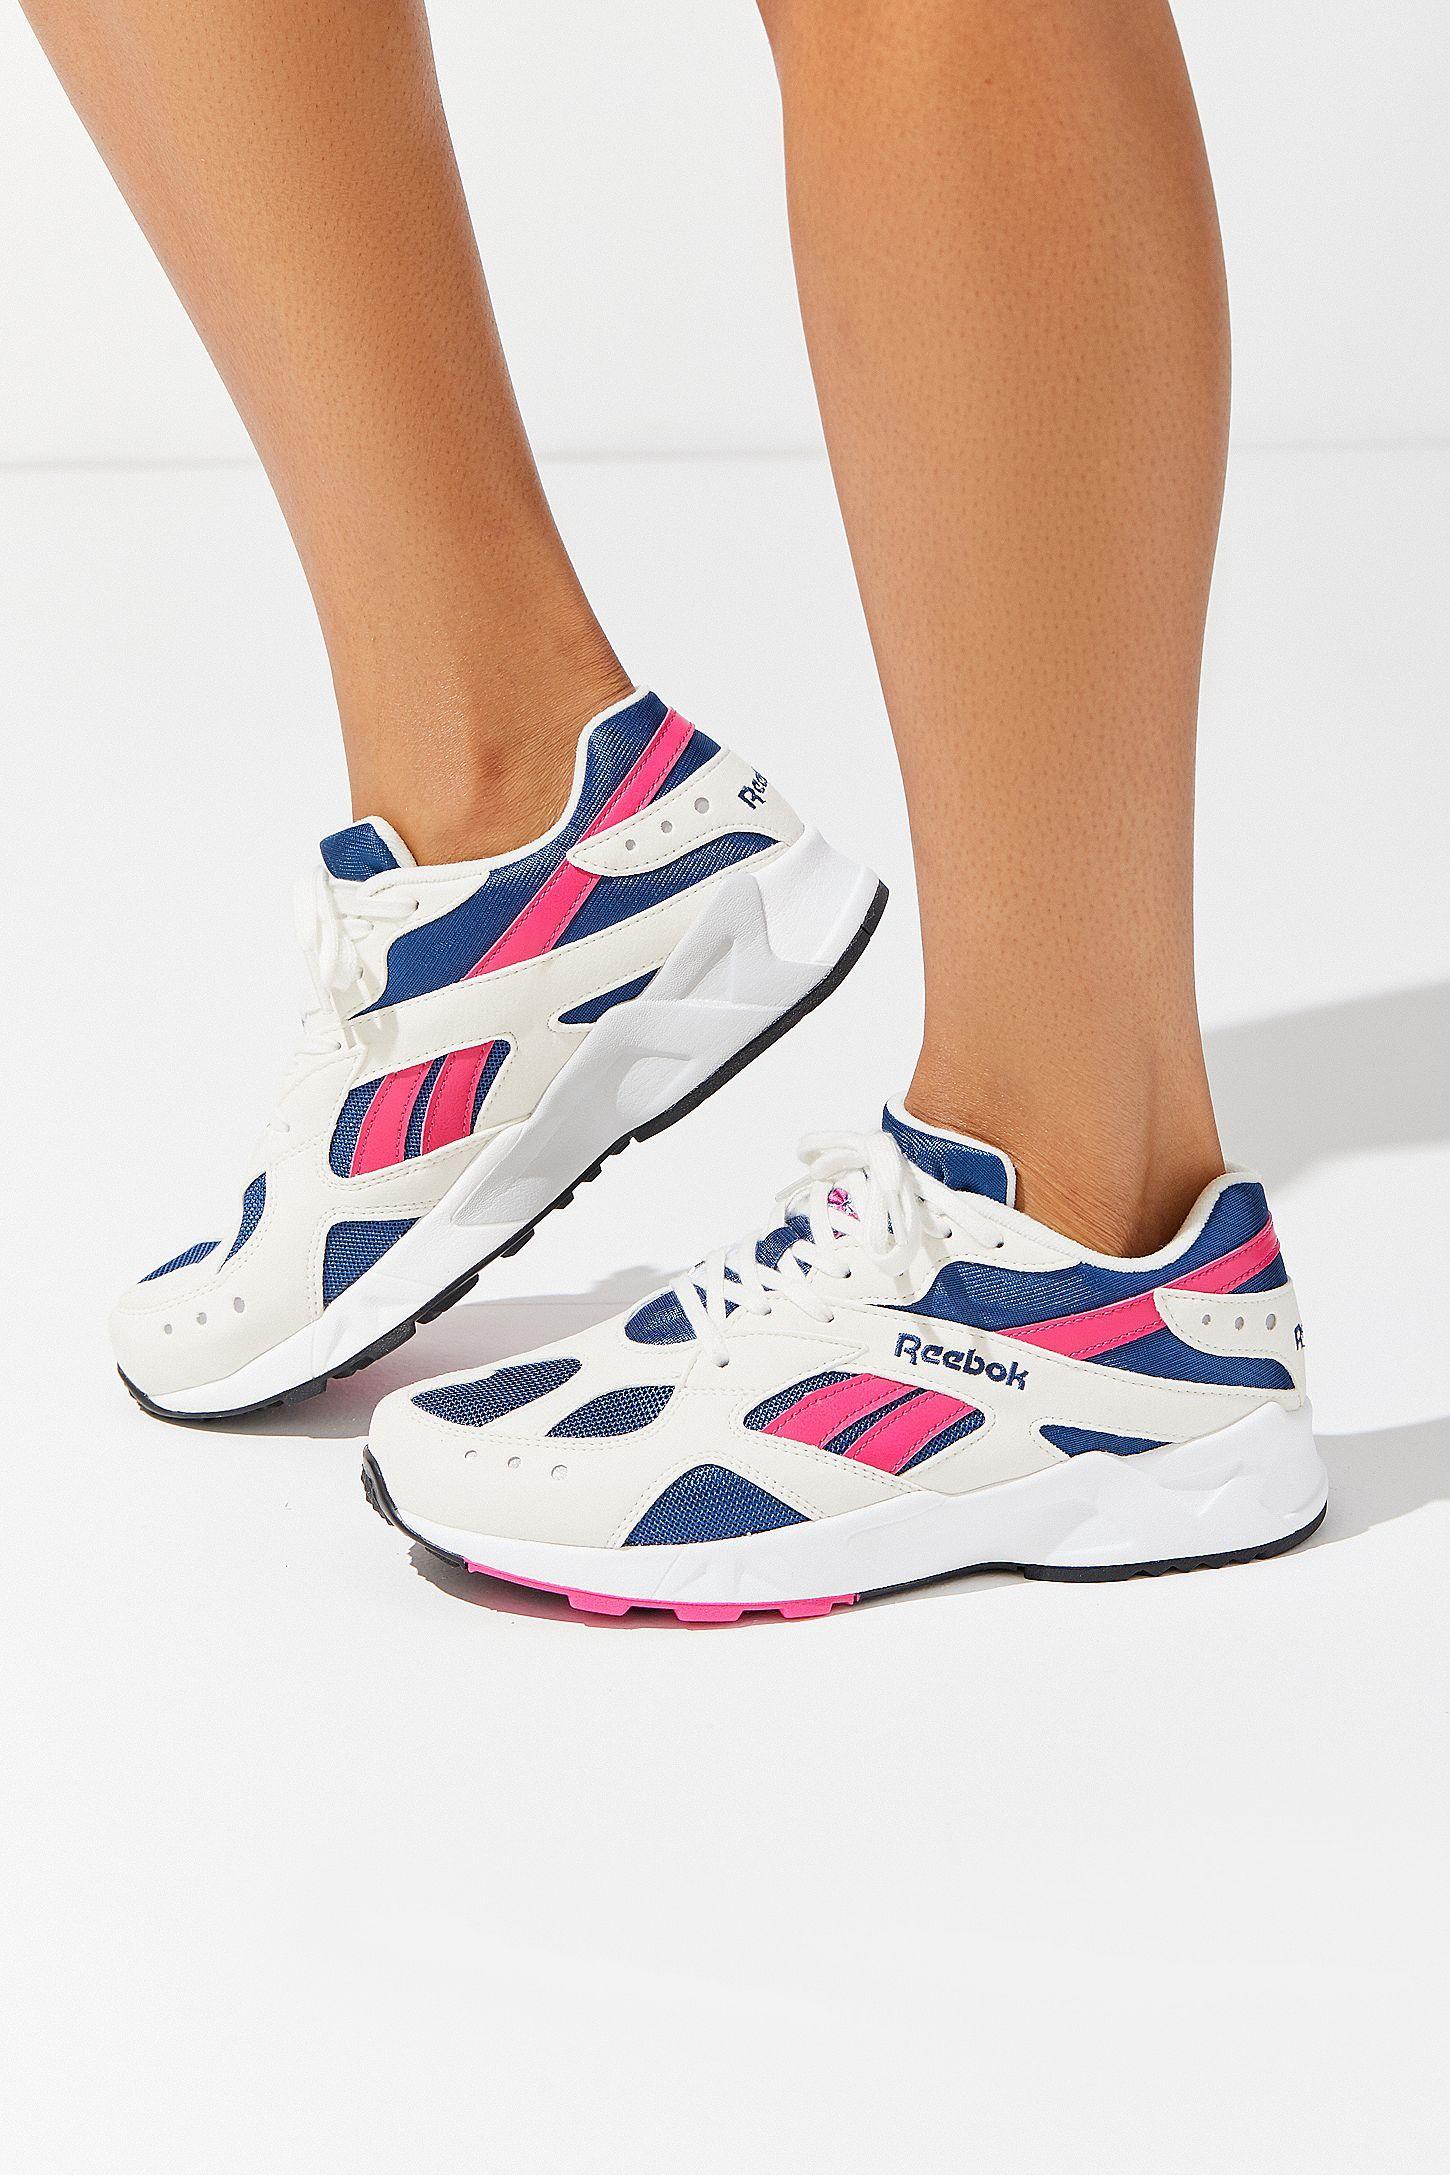 Slide View  6  Reebok Aztrek Sneaker 8d9ec904e1e